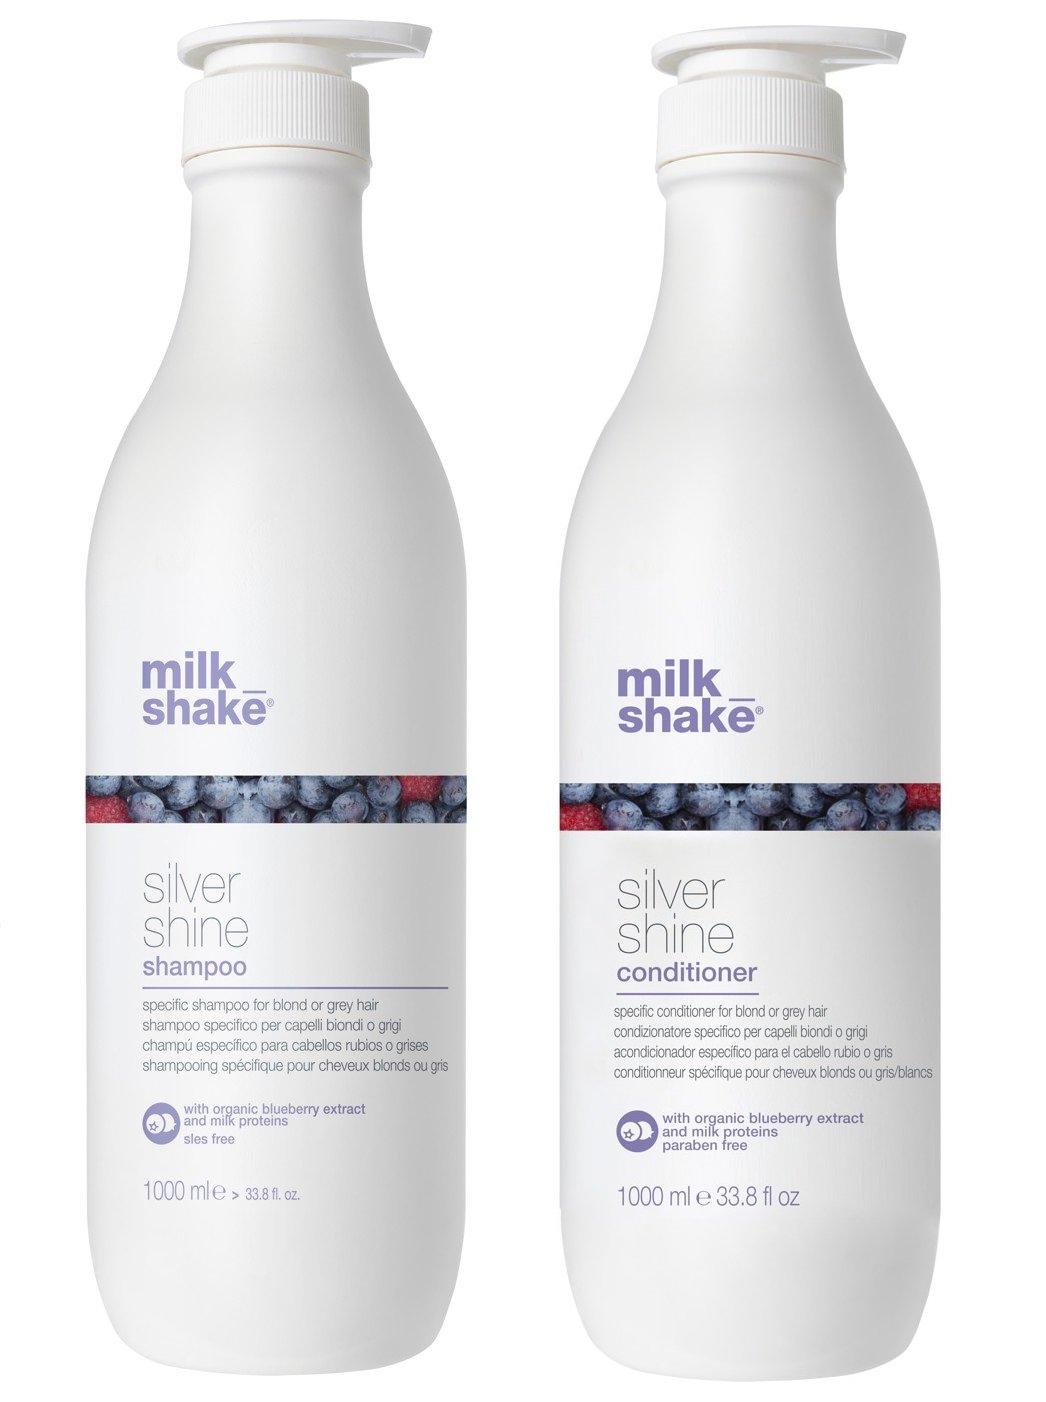 milk_shake - Silver Shine Shampoo 1000 ml + Silver Shine Conditioner 1000 ml